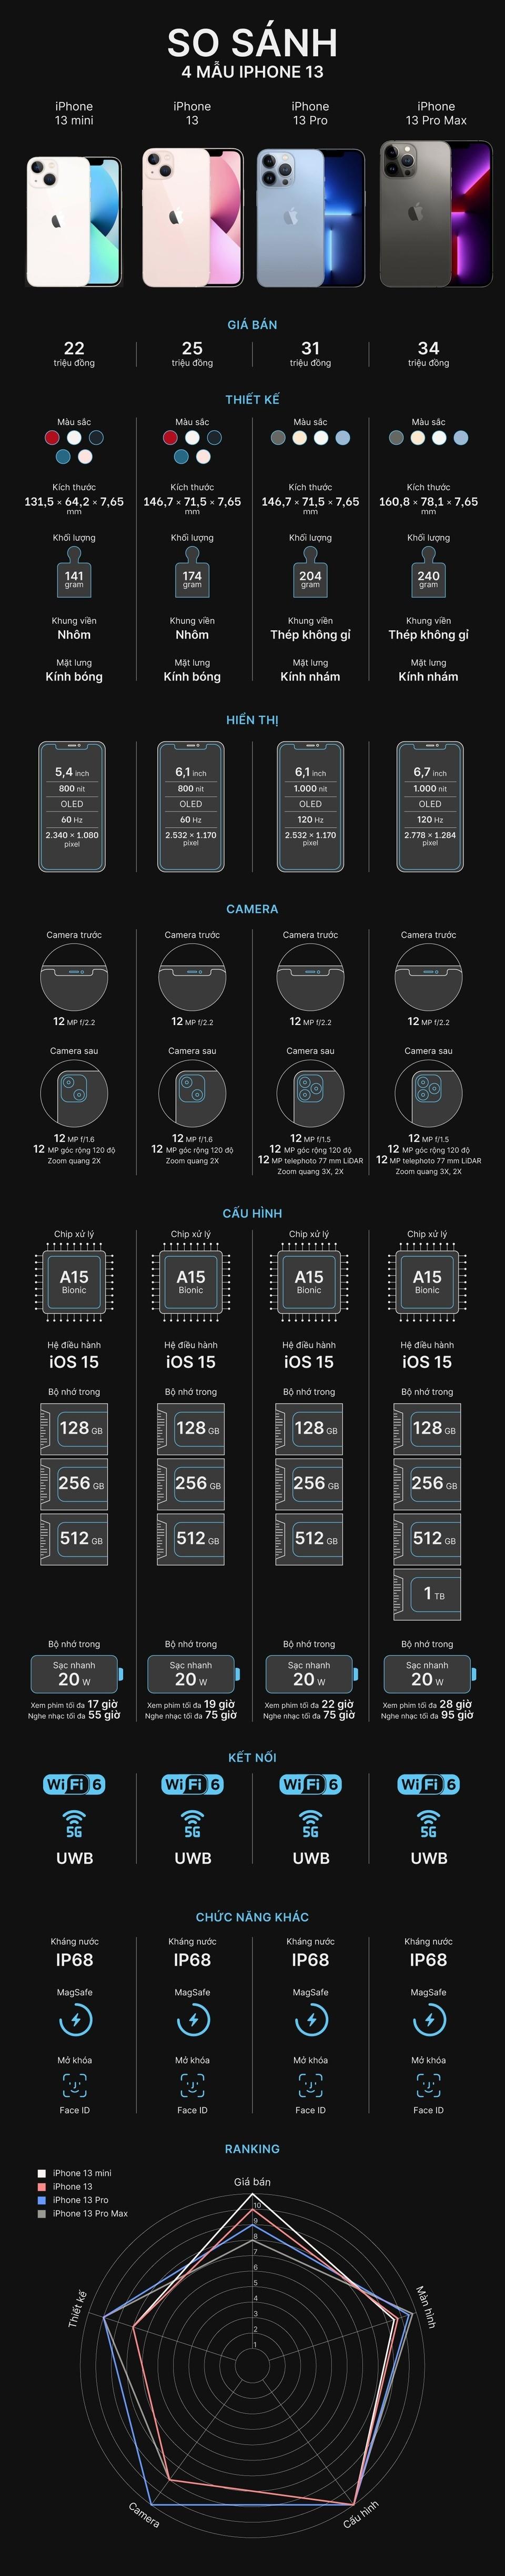 infographic-iphone13-1631850959.jpg